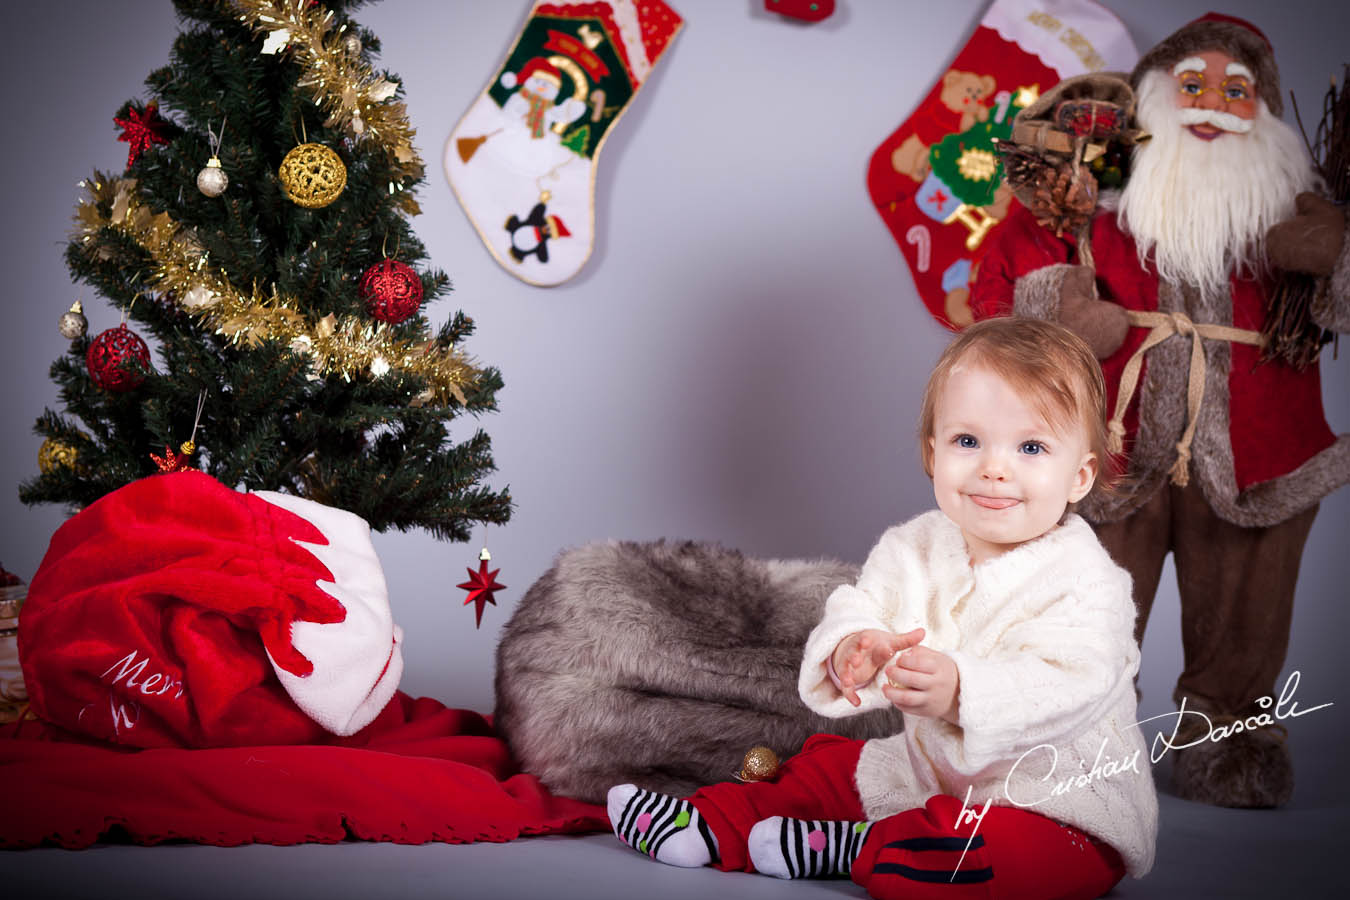 Paula - Christmas Photo Session by Cristian Dascalu - 2011